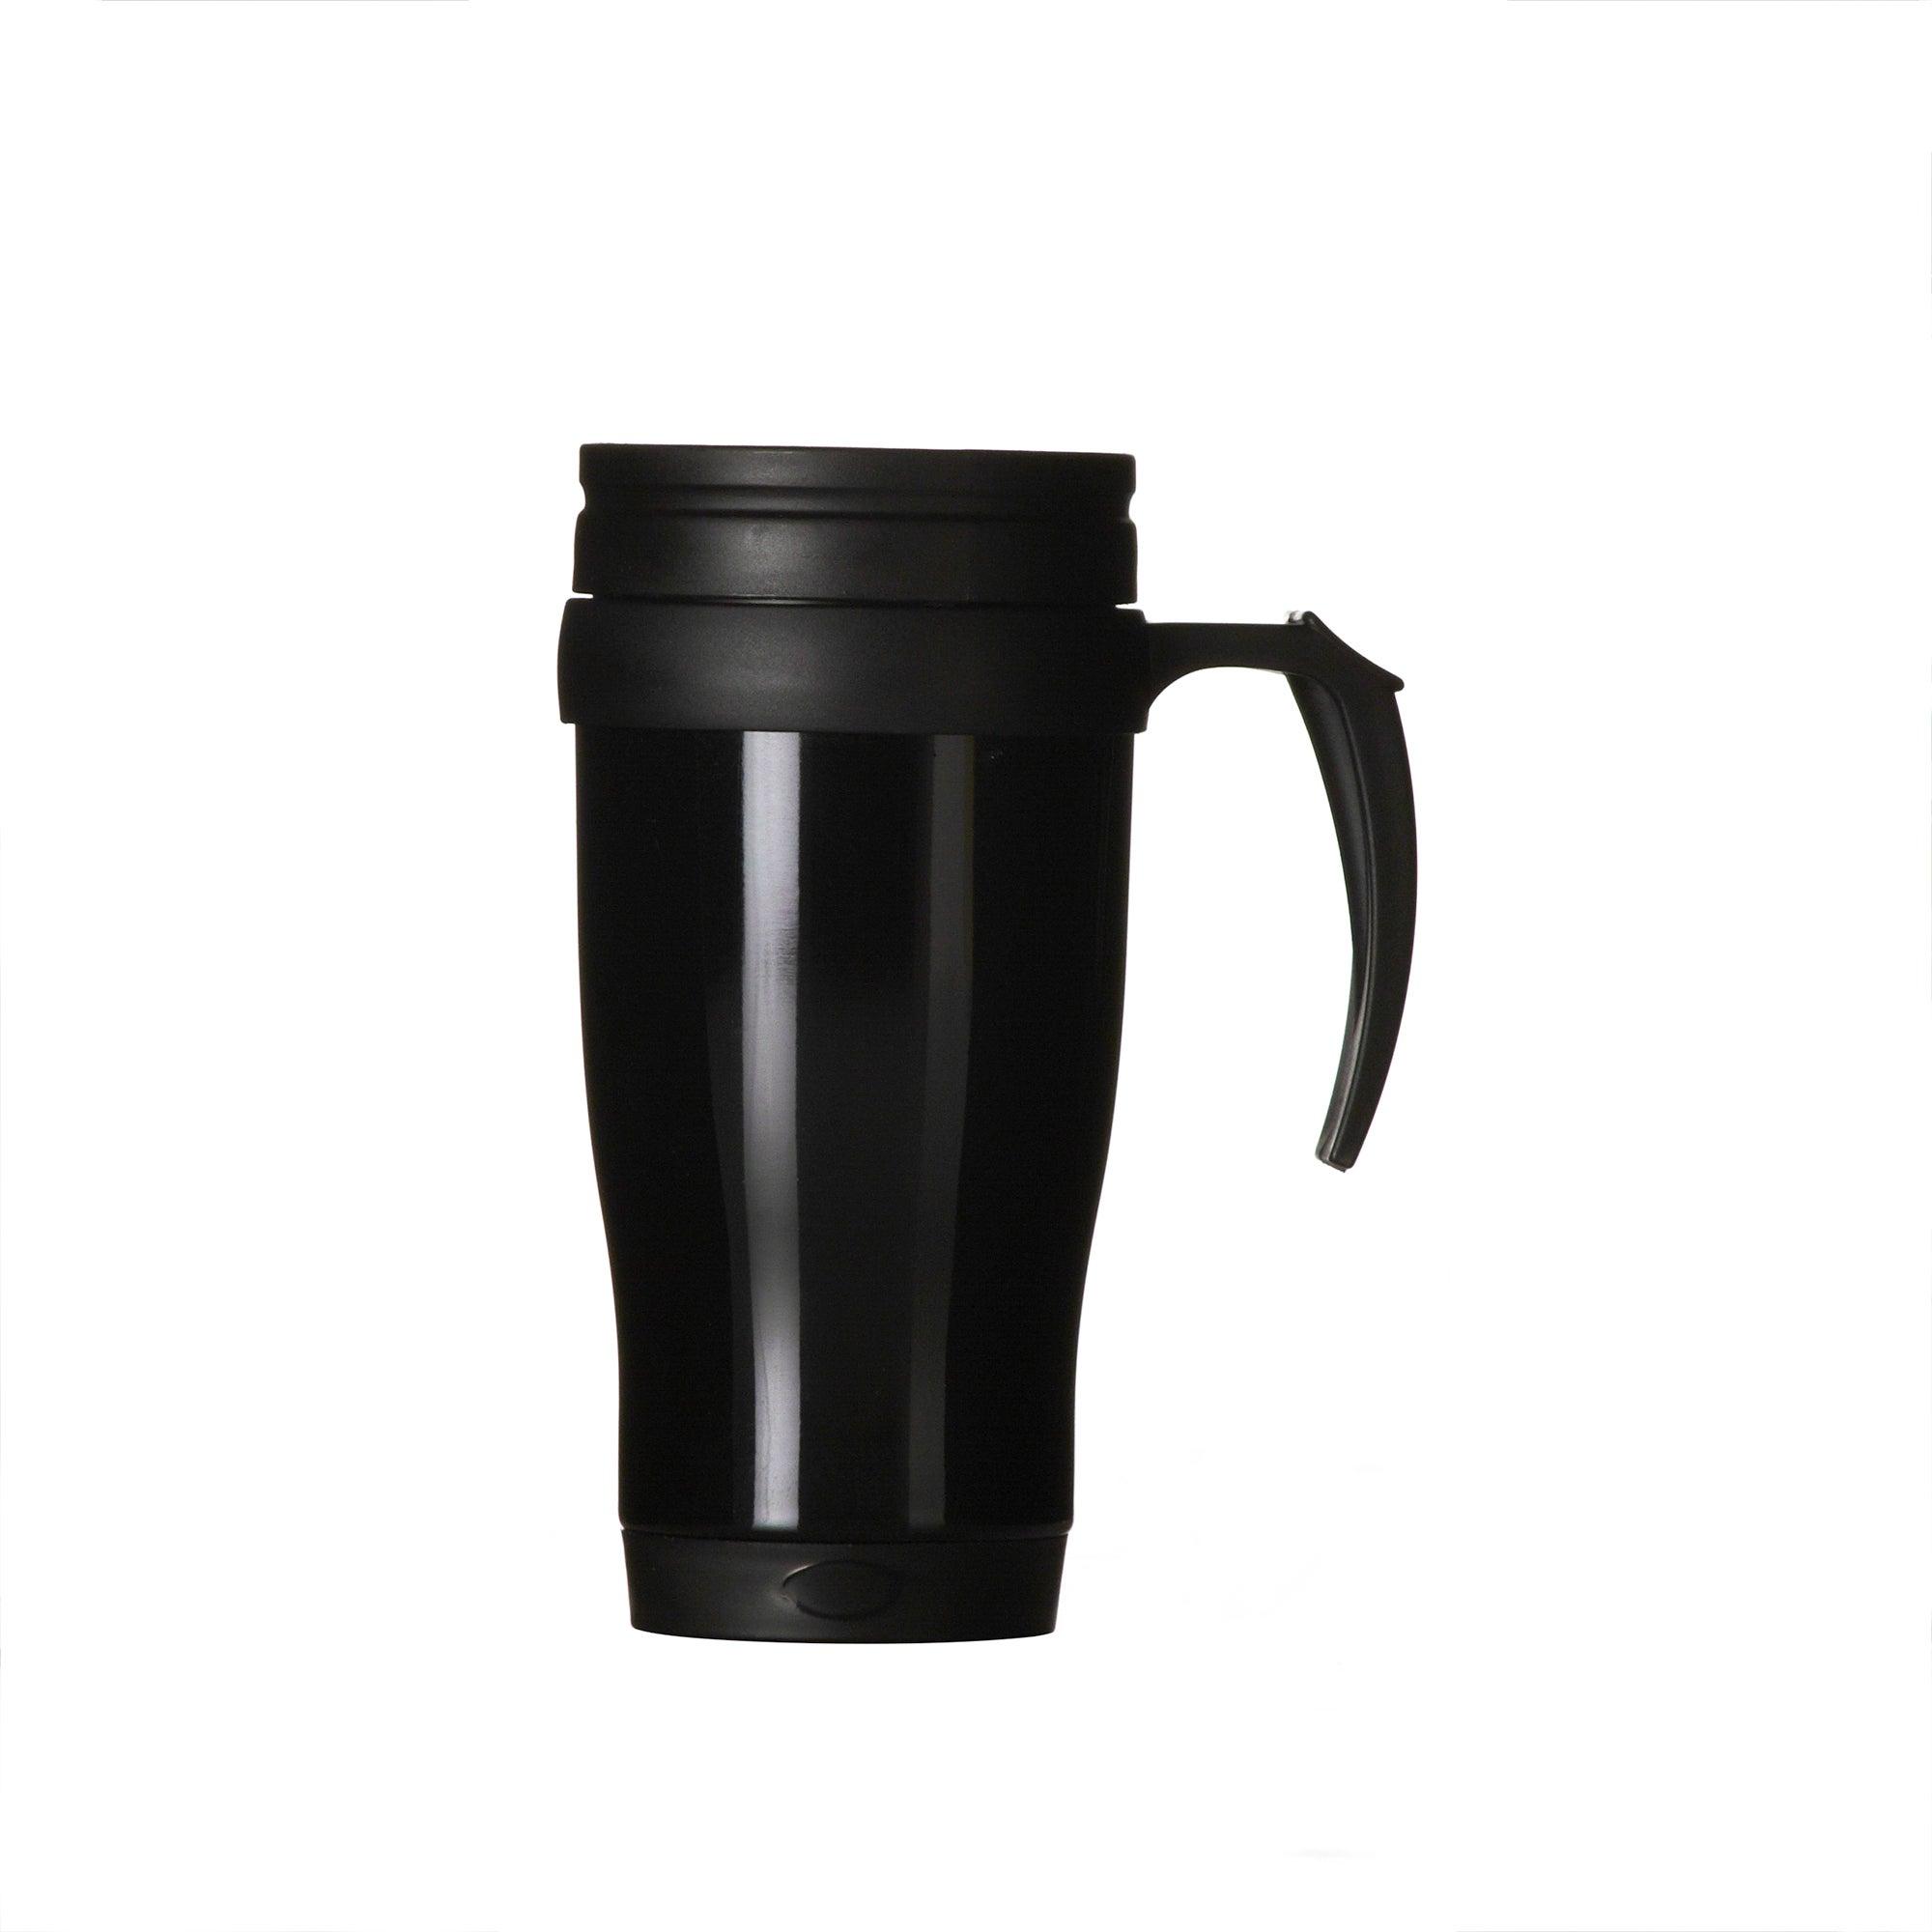 Black Spectrum Collection Stainless Steel Travel Mug